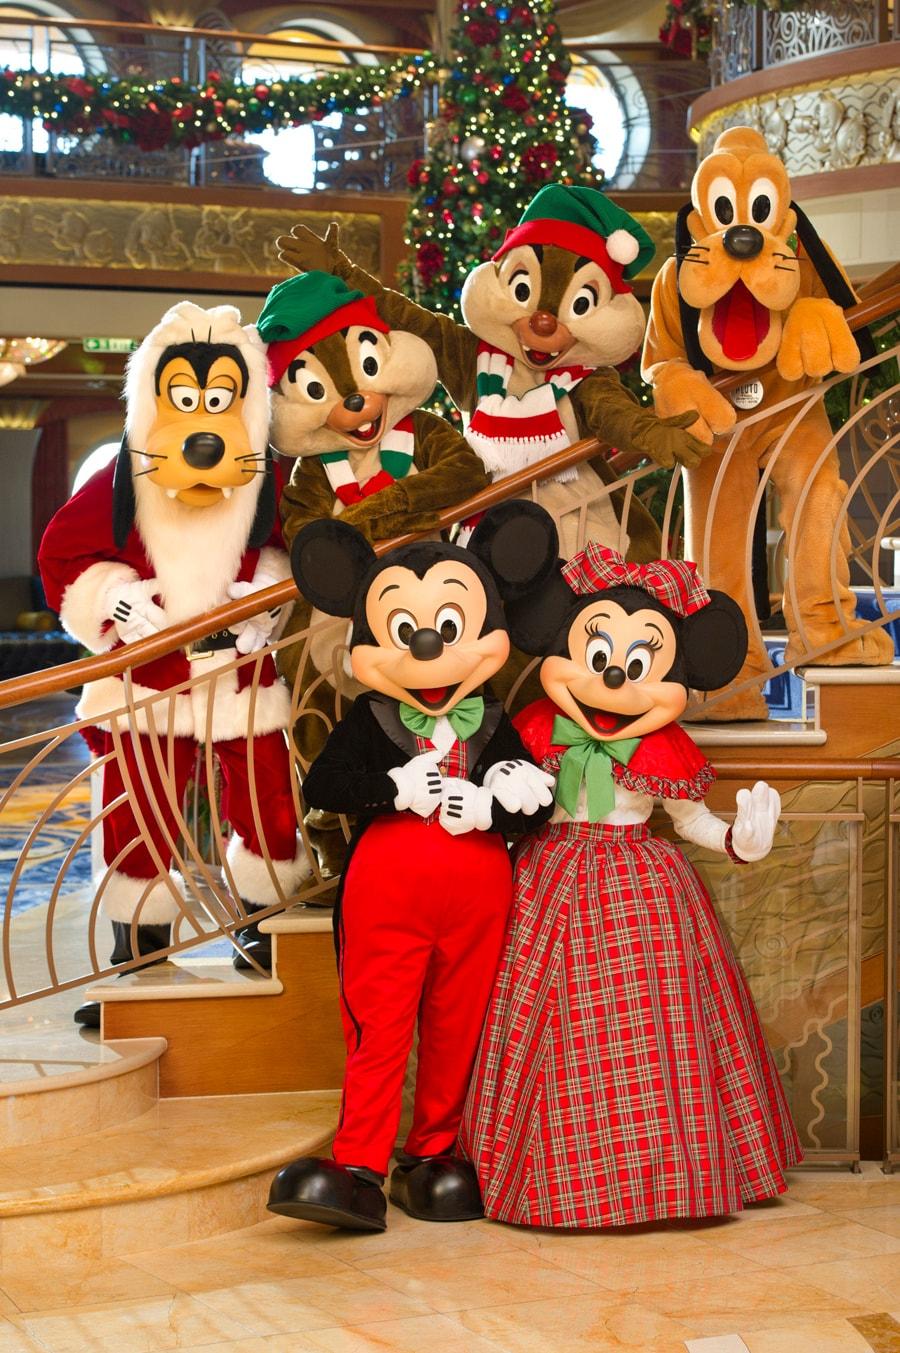 Merry Christmas Disney.Merry Christmas From Disney Cruise Line Disney Parks Blog